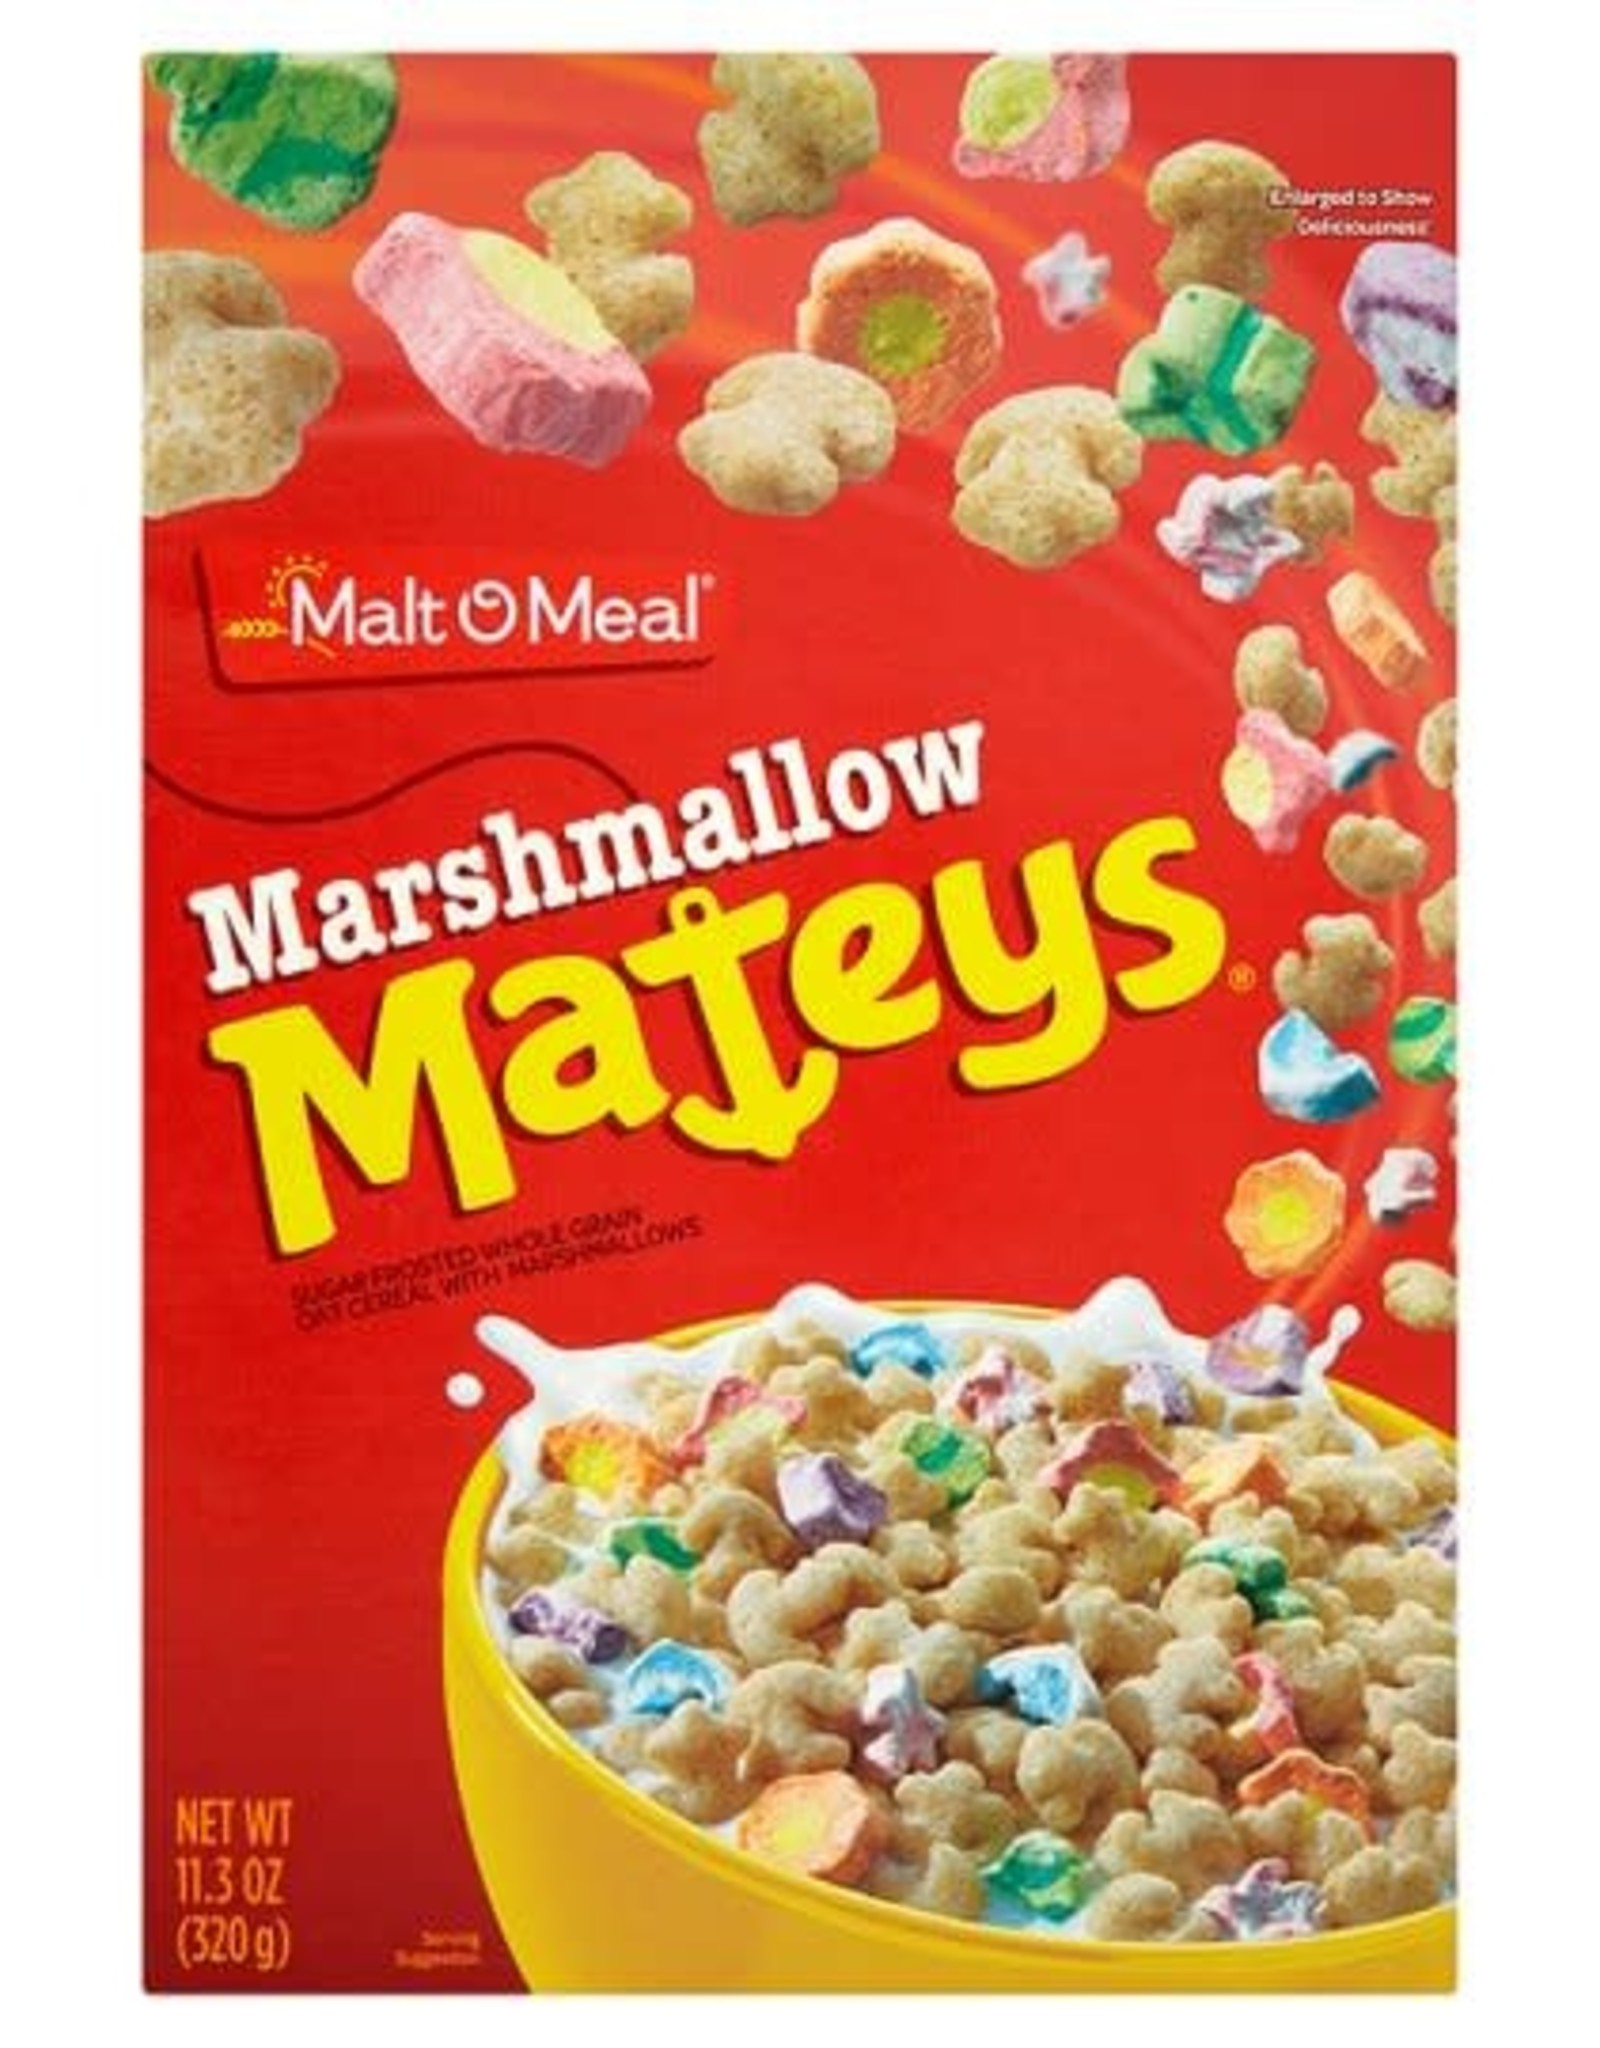 MaltOMeal Marshmallow Mateys 320 g